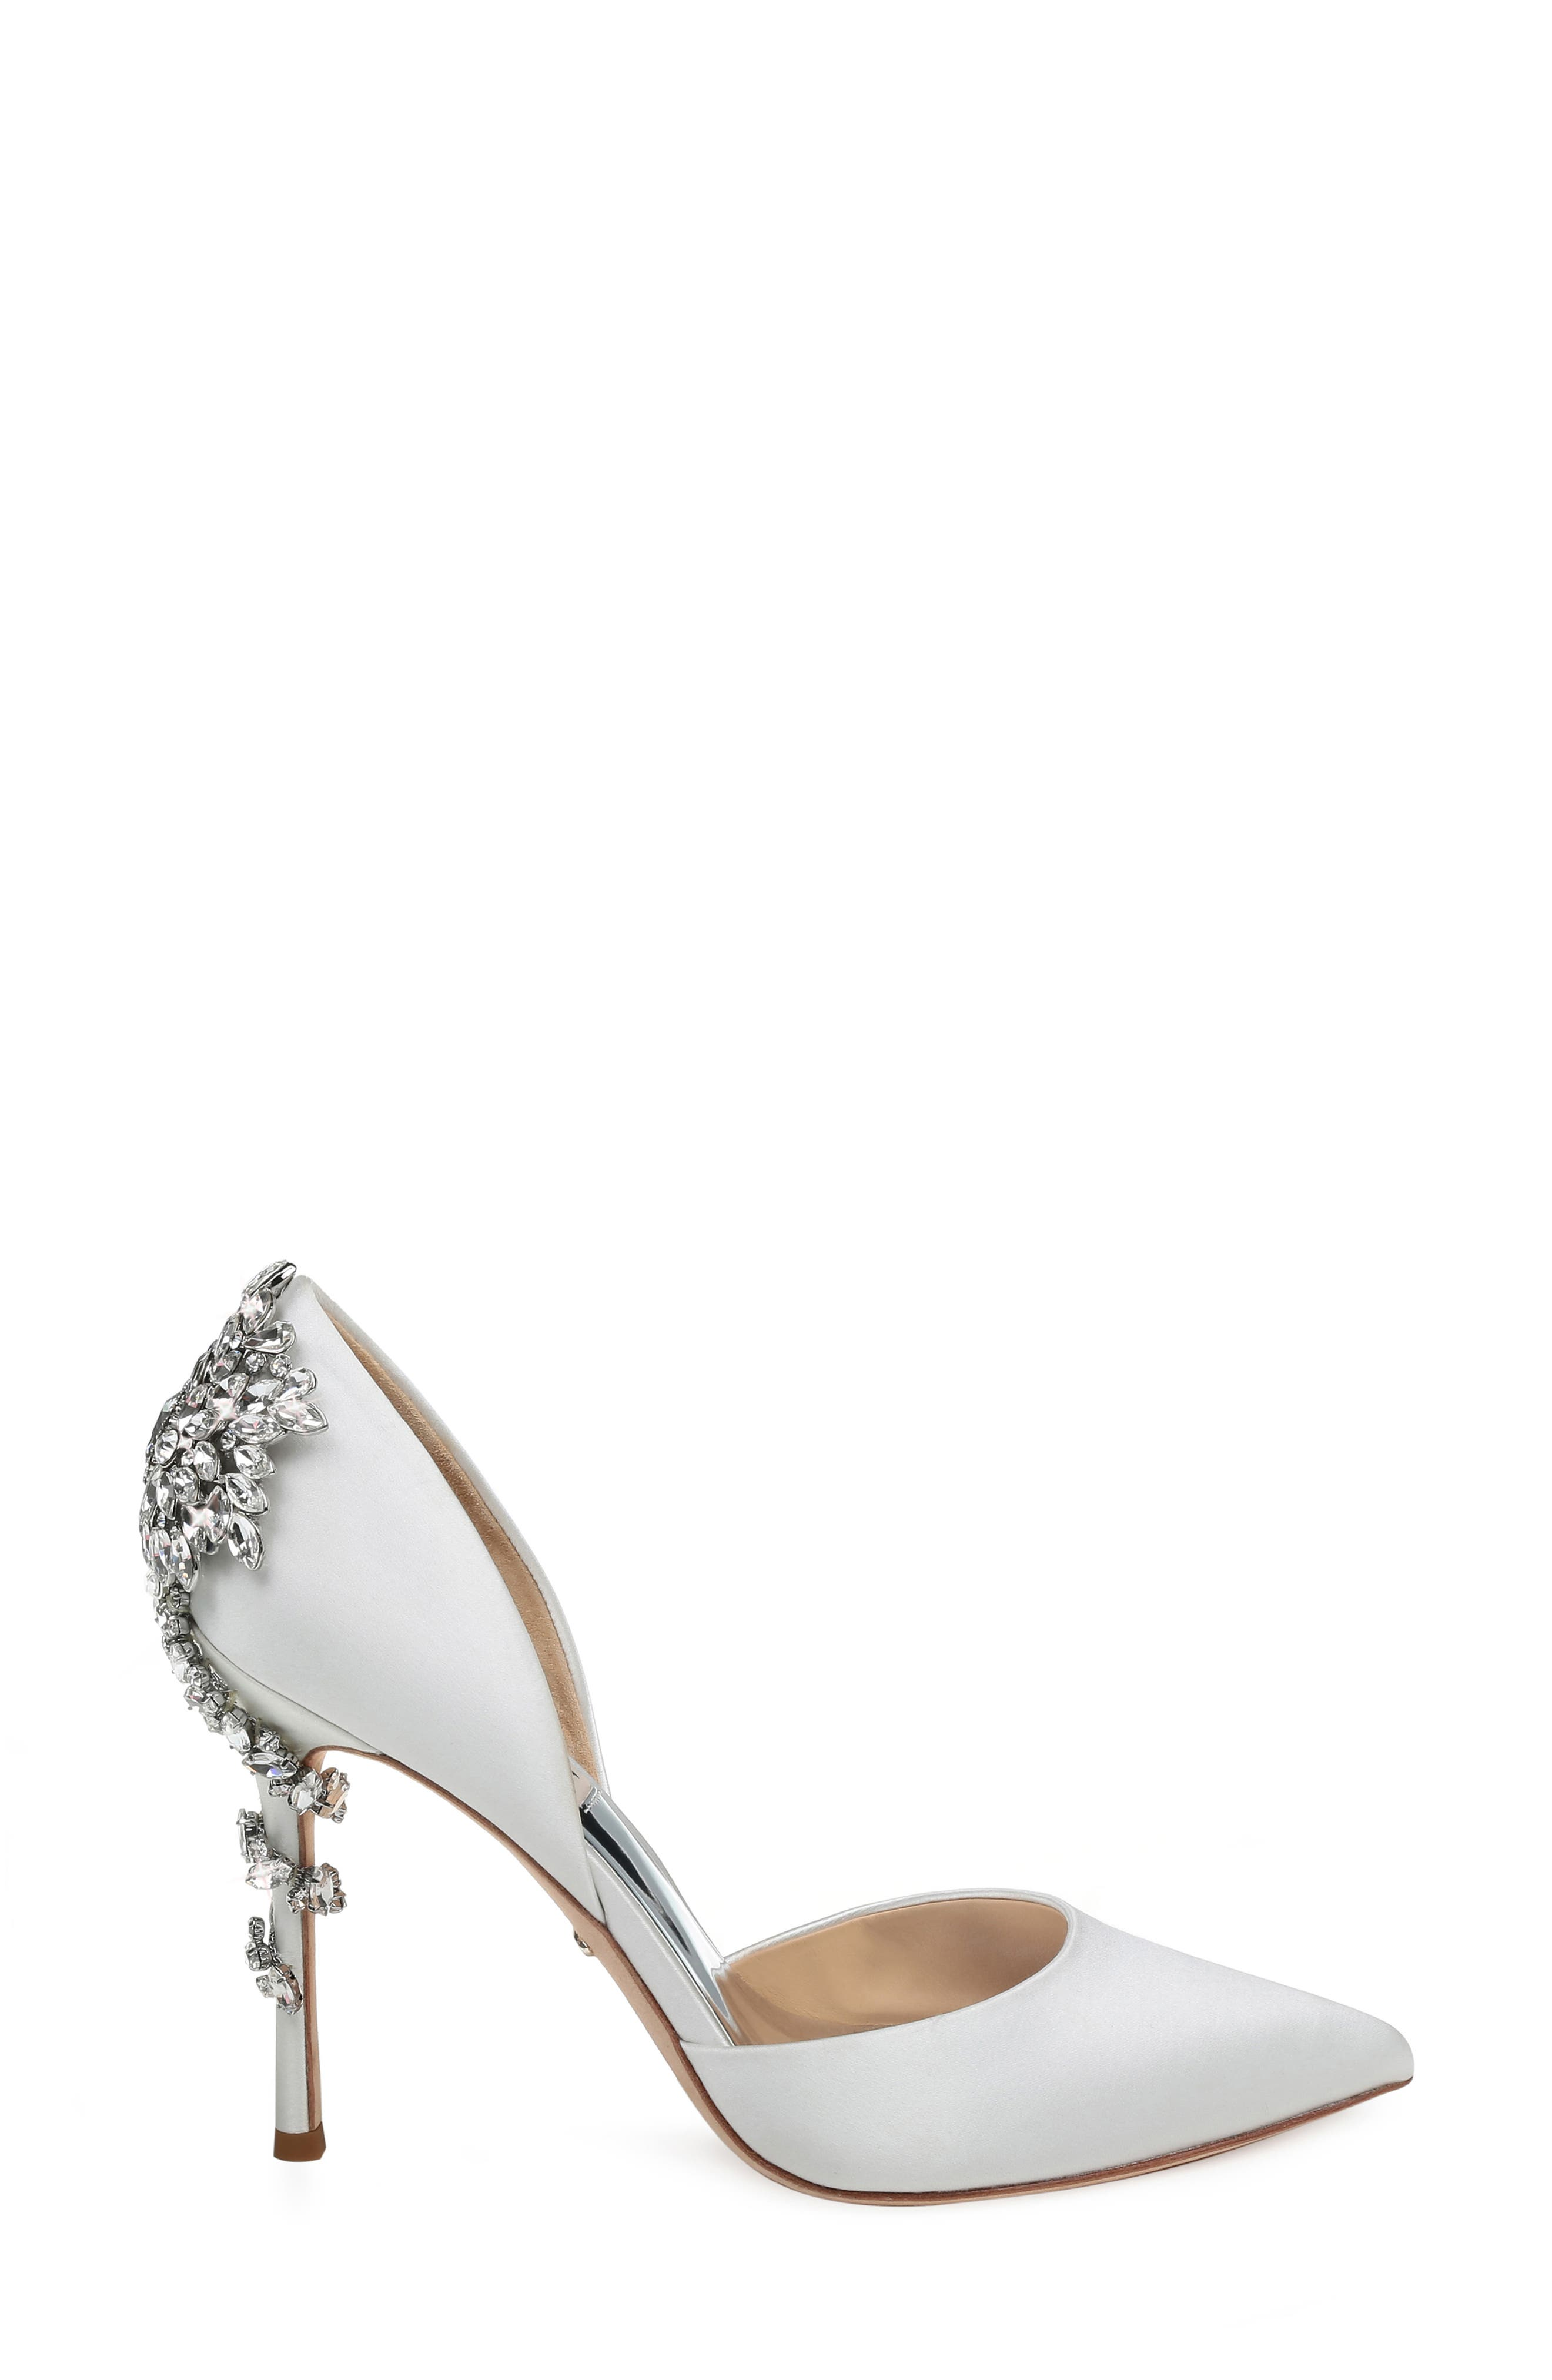 BADGLEY MISCHKA COLLECTION, Badgley Mischka Vogue Crystal Embellished d'Orsay Pump, Alternate thumbnail 3, color, SOFT WHITE SATIN